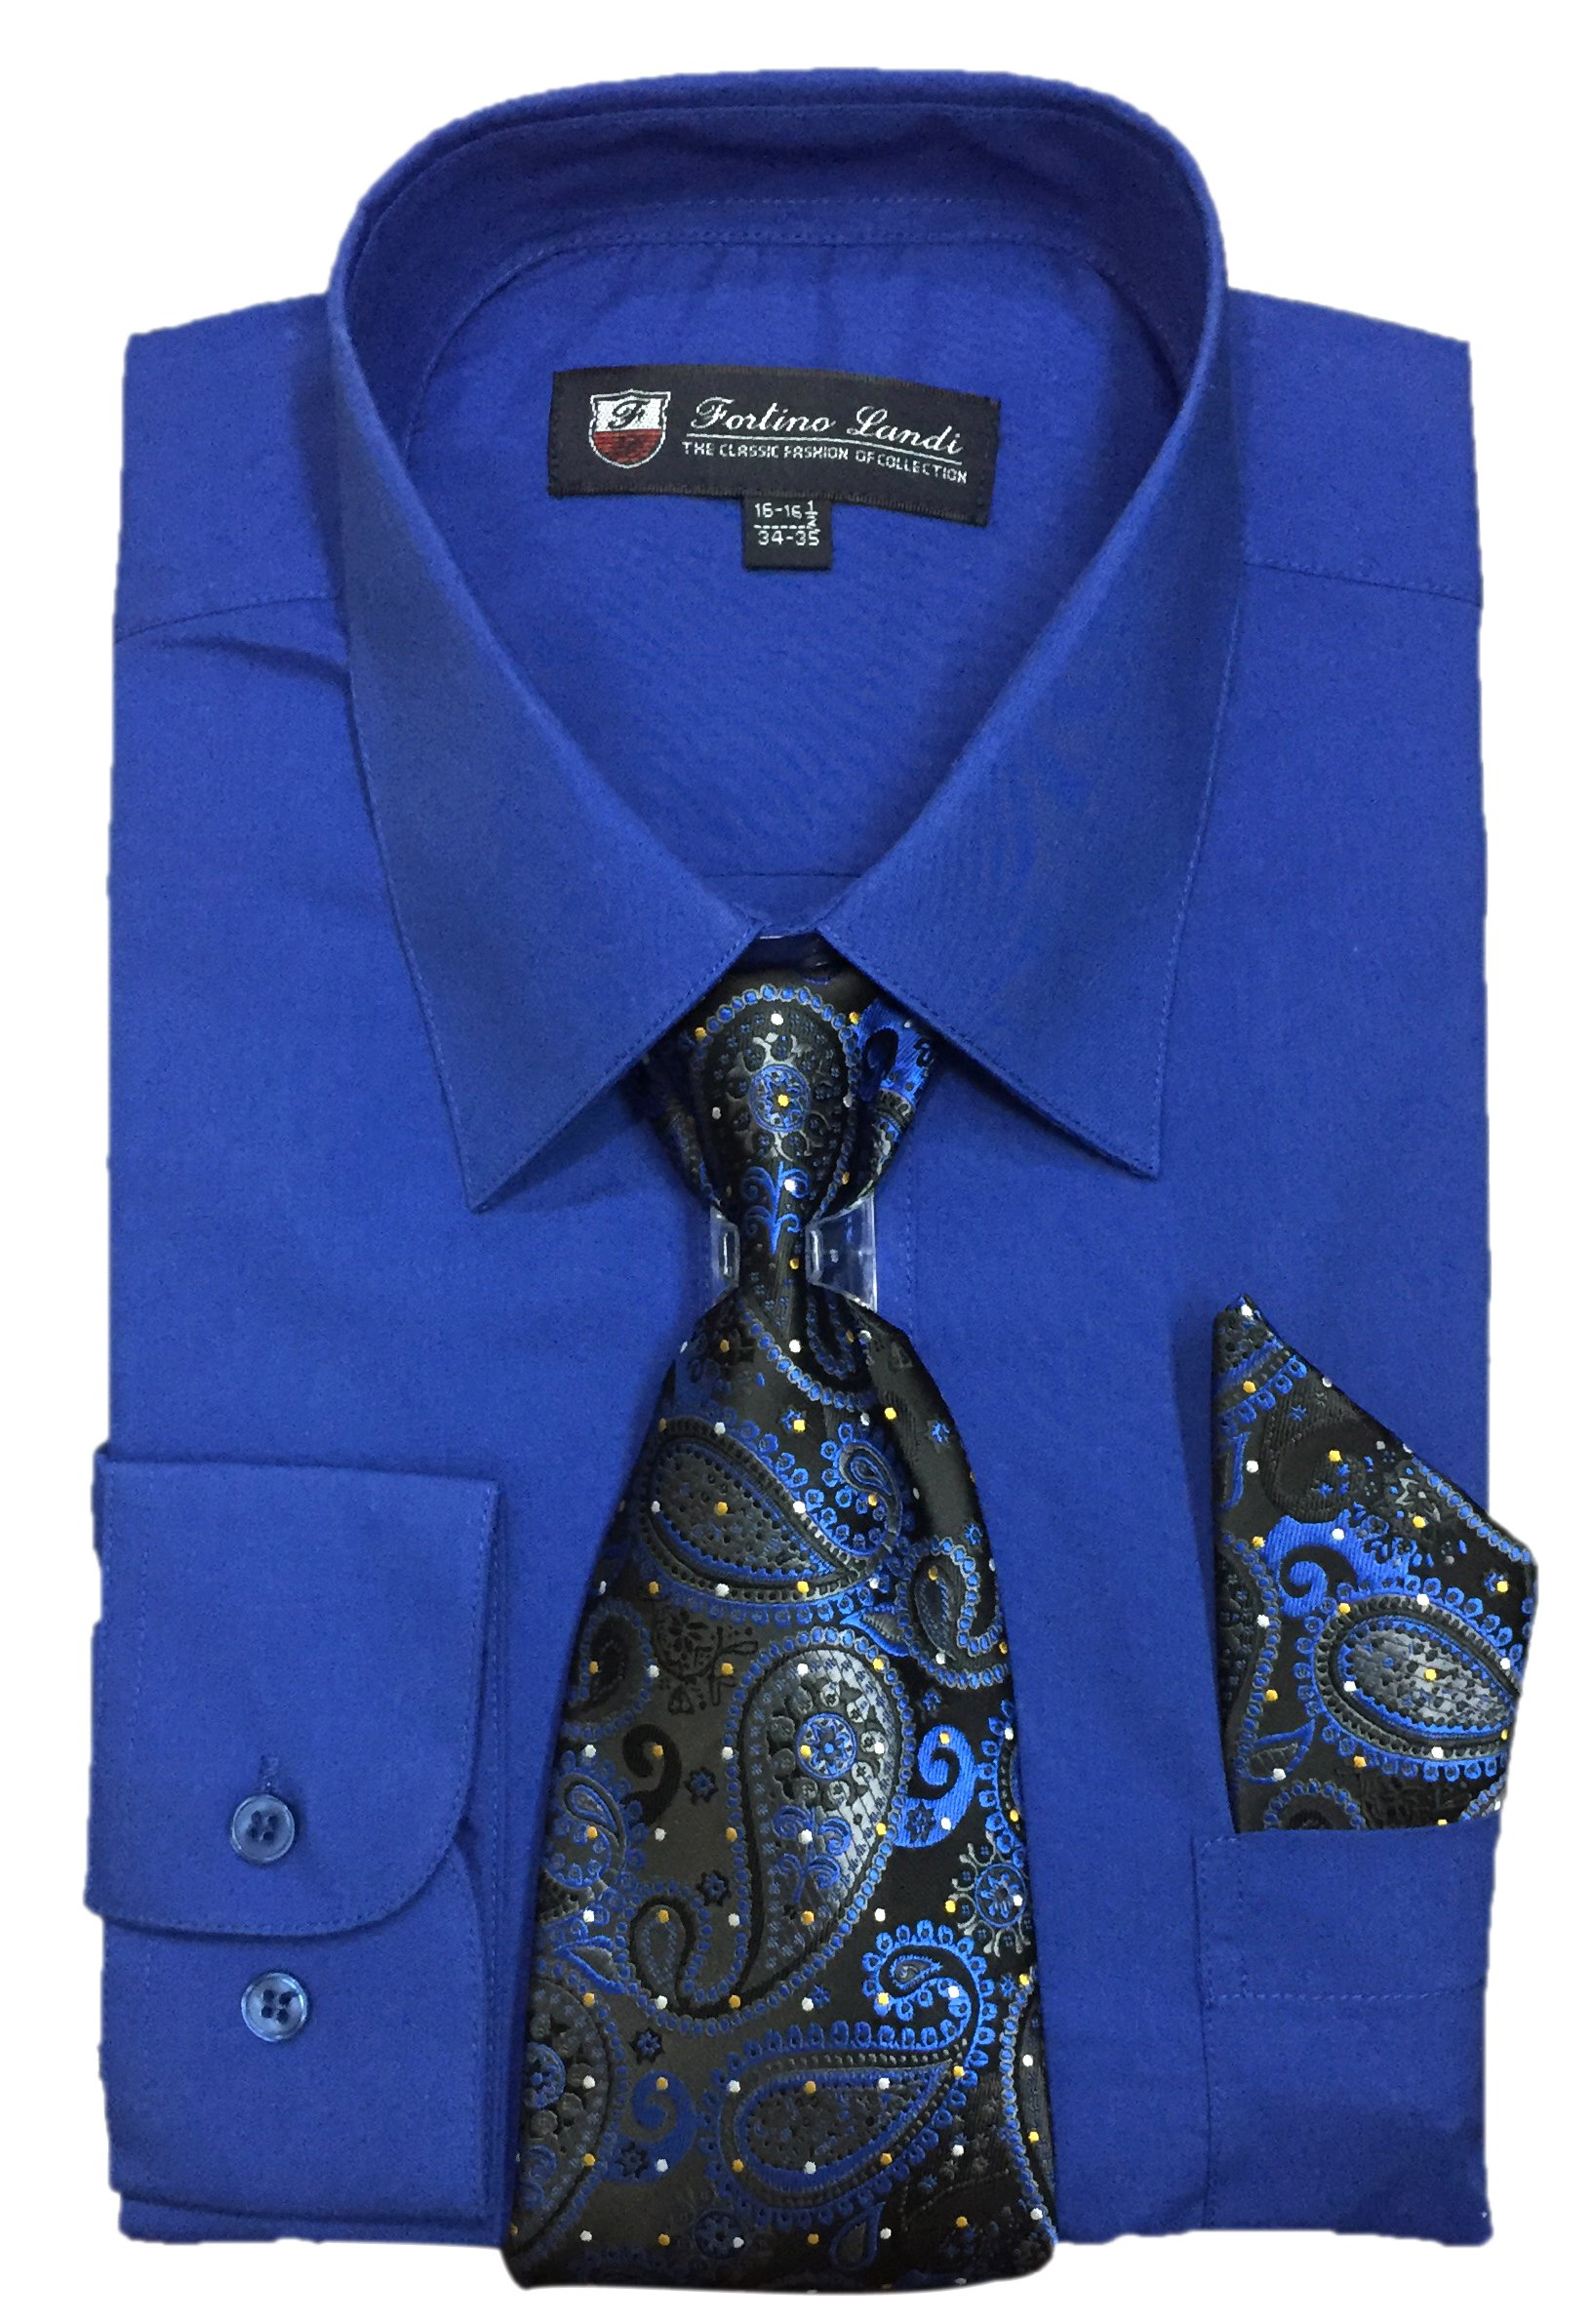 "Fortino Landi Men's Long Sleeve Dress Shirt With Matching Tie And Handkerchief (17-17.5"" Neck 34/35"" Sleeve (XLarge), Royal Blue)"